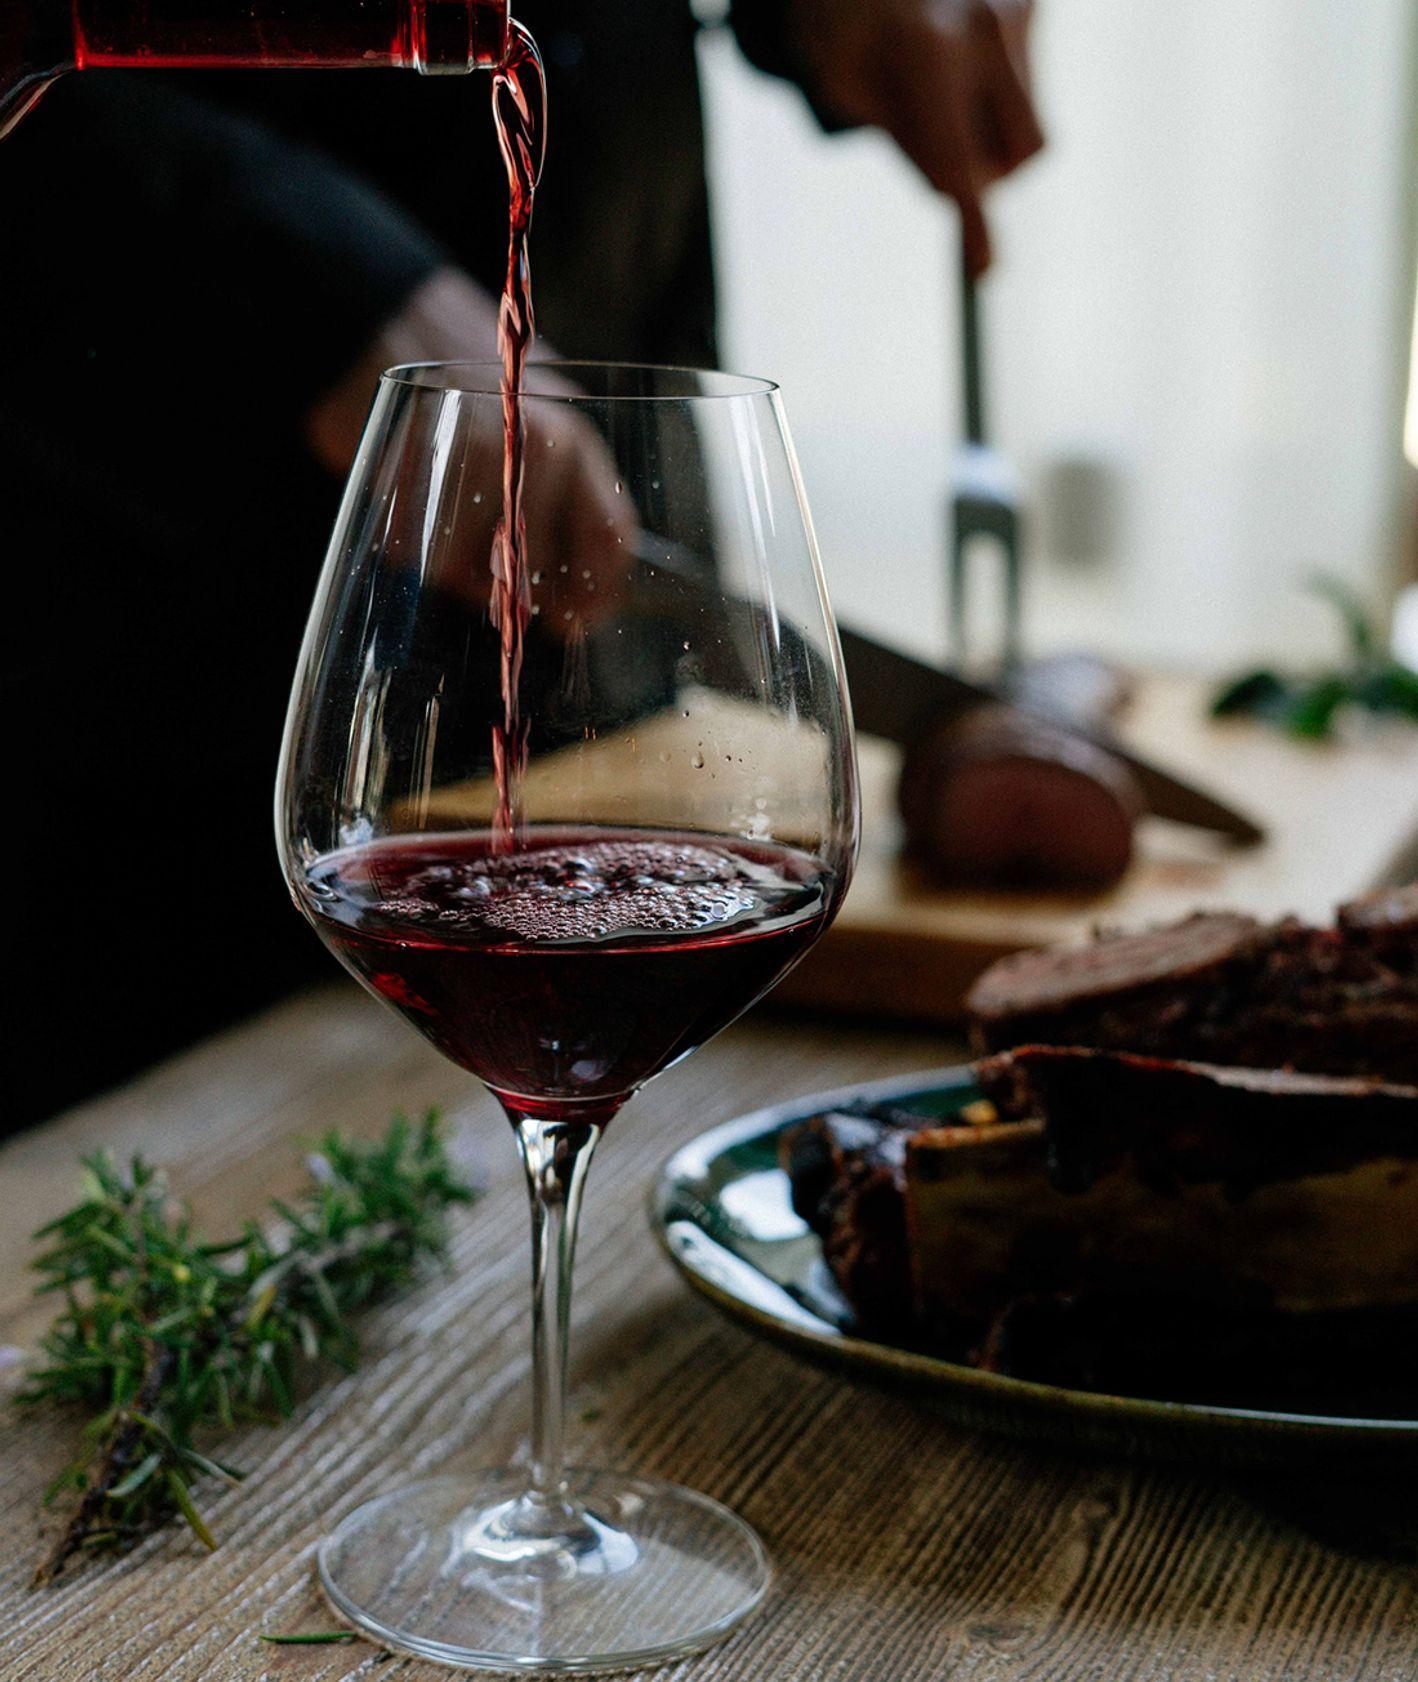 Napełnianie winem kieliszka podczas posiłku (fot. Lefteris Kallergis / unsplash.com)